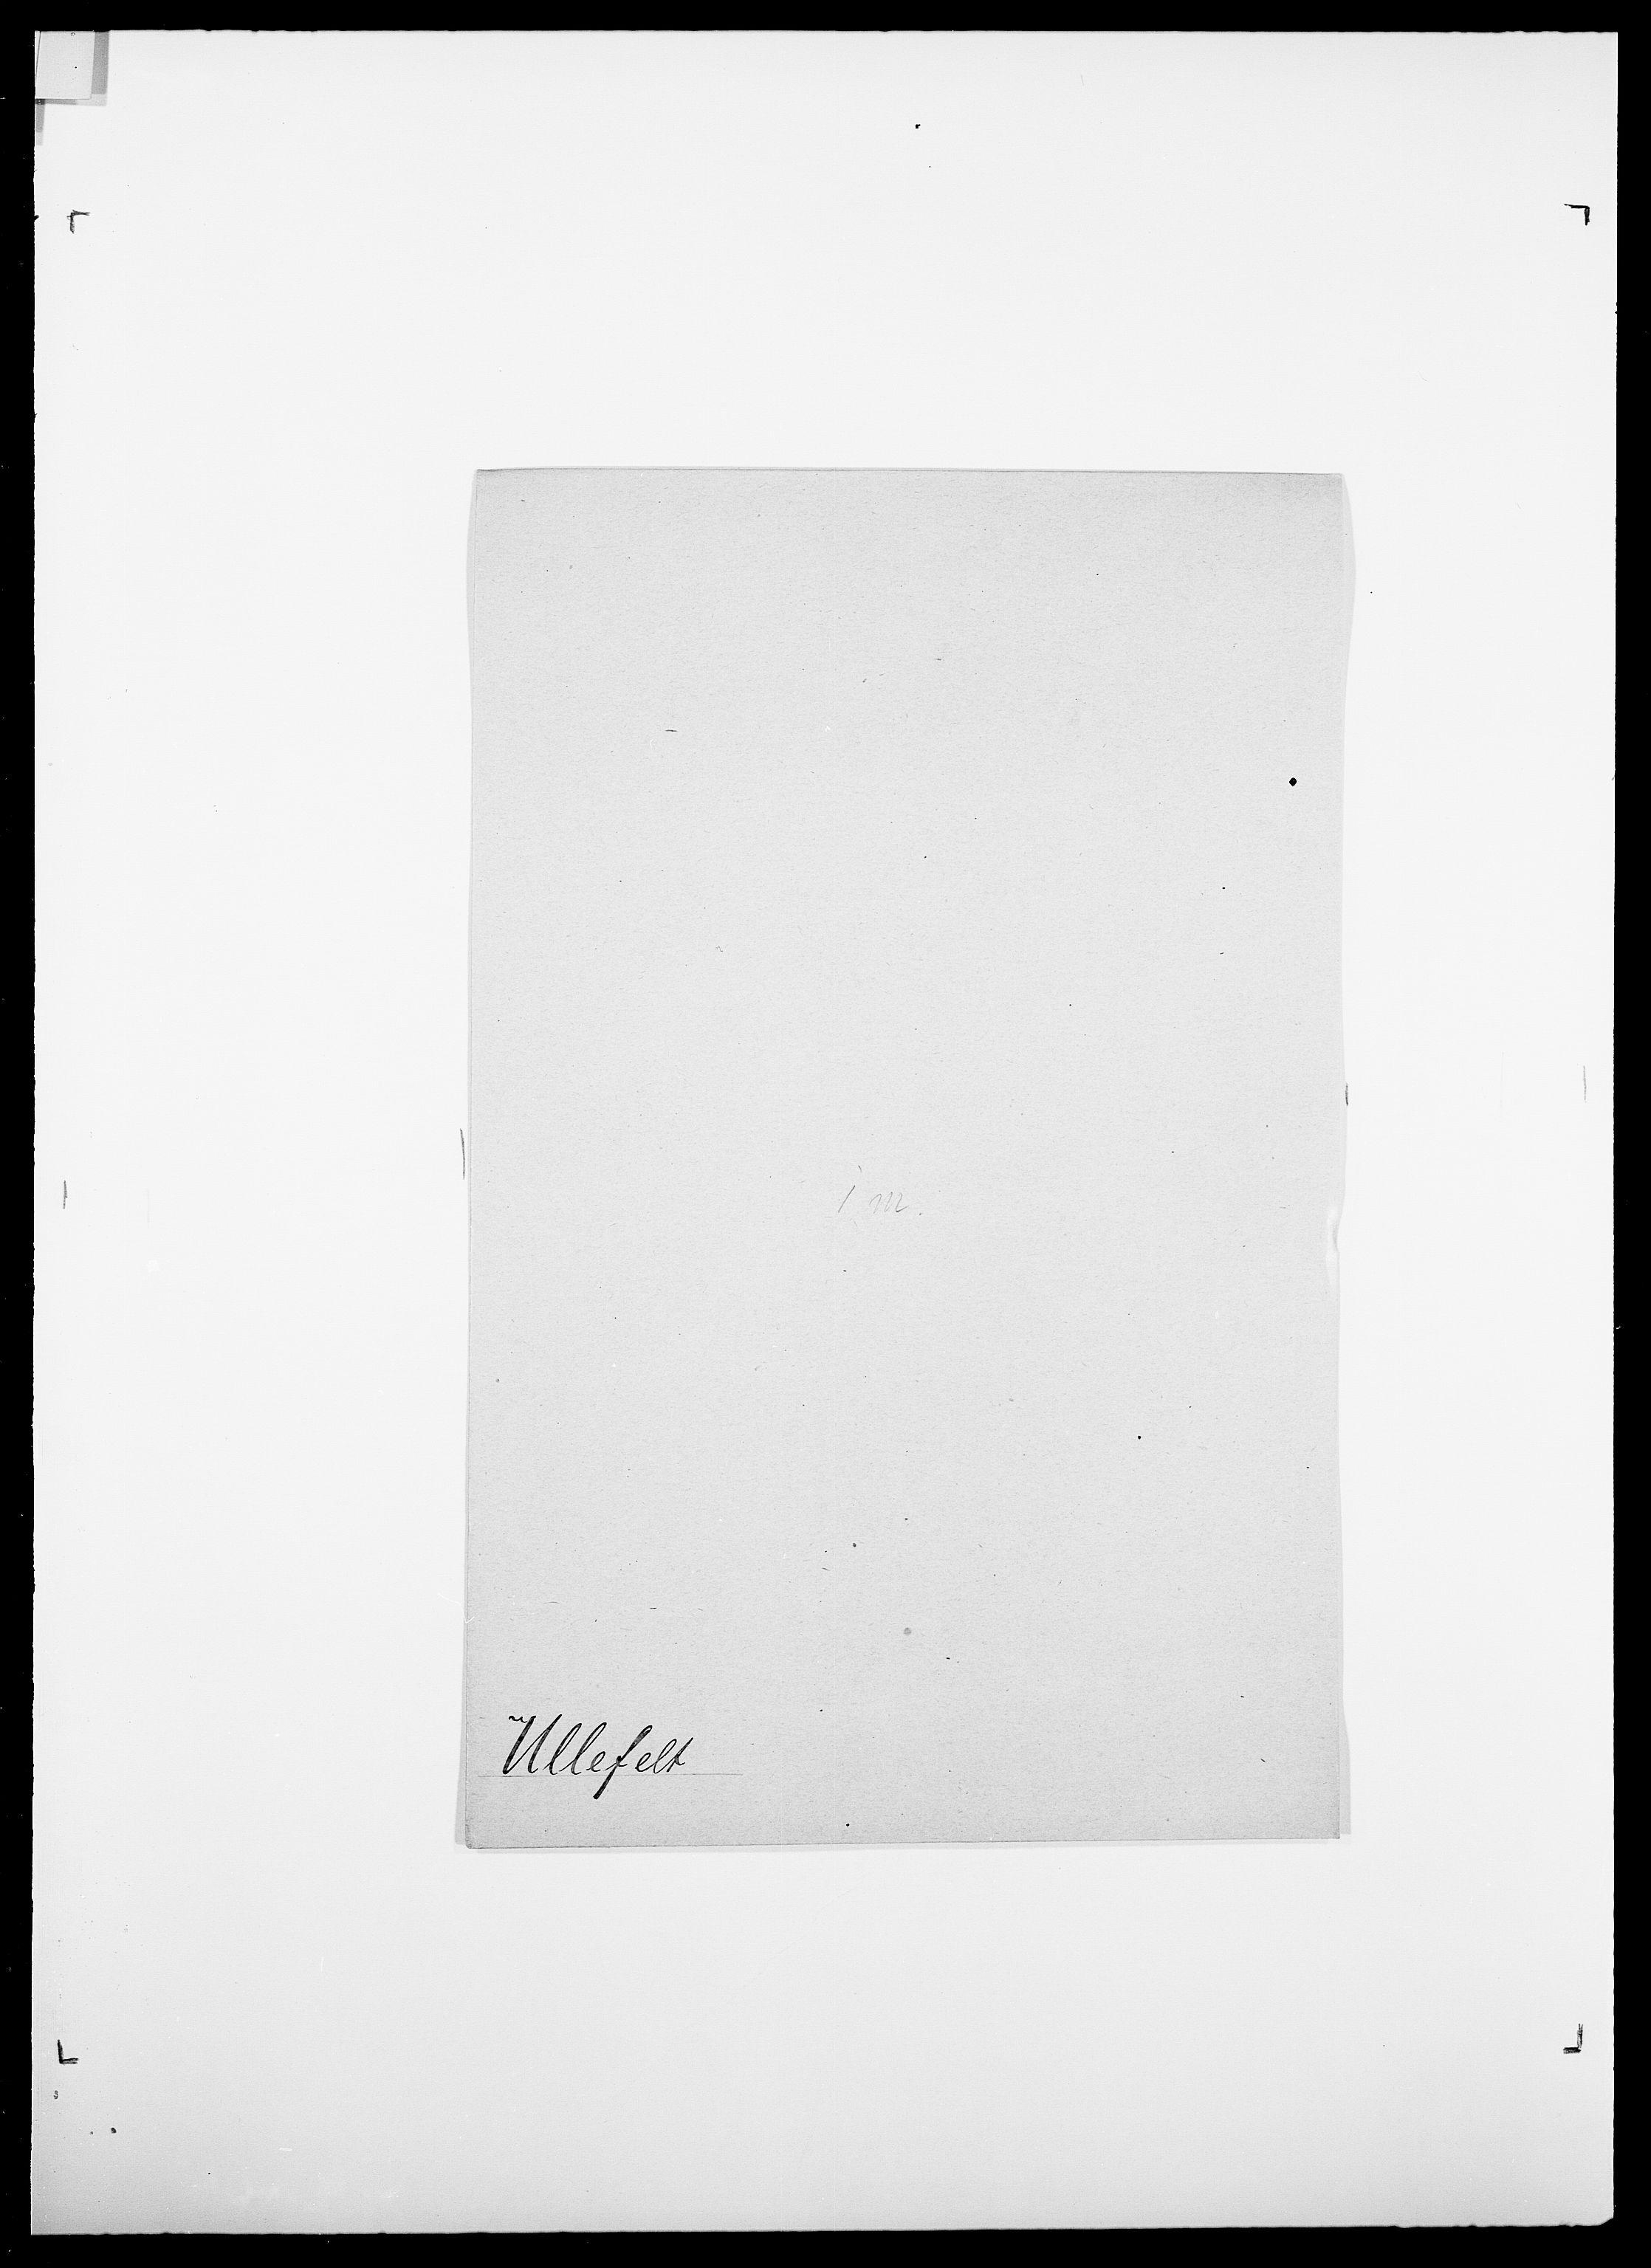 SAO, Delgobe, Charles Antoine - samling, D/Da/L0039: Thorsen - Urup, s. 665